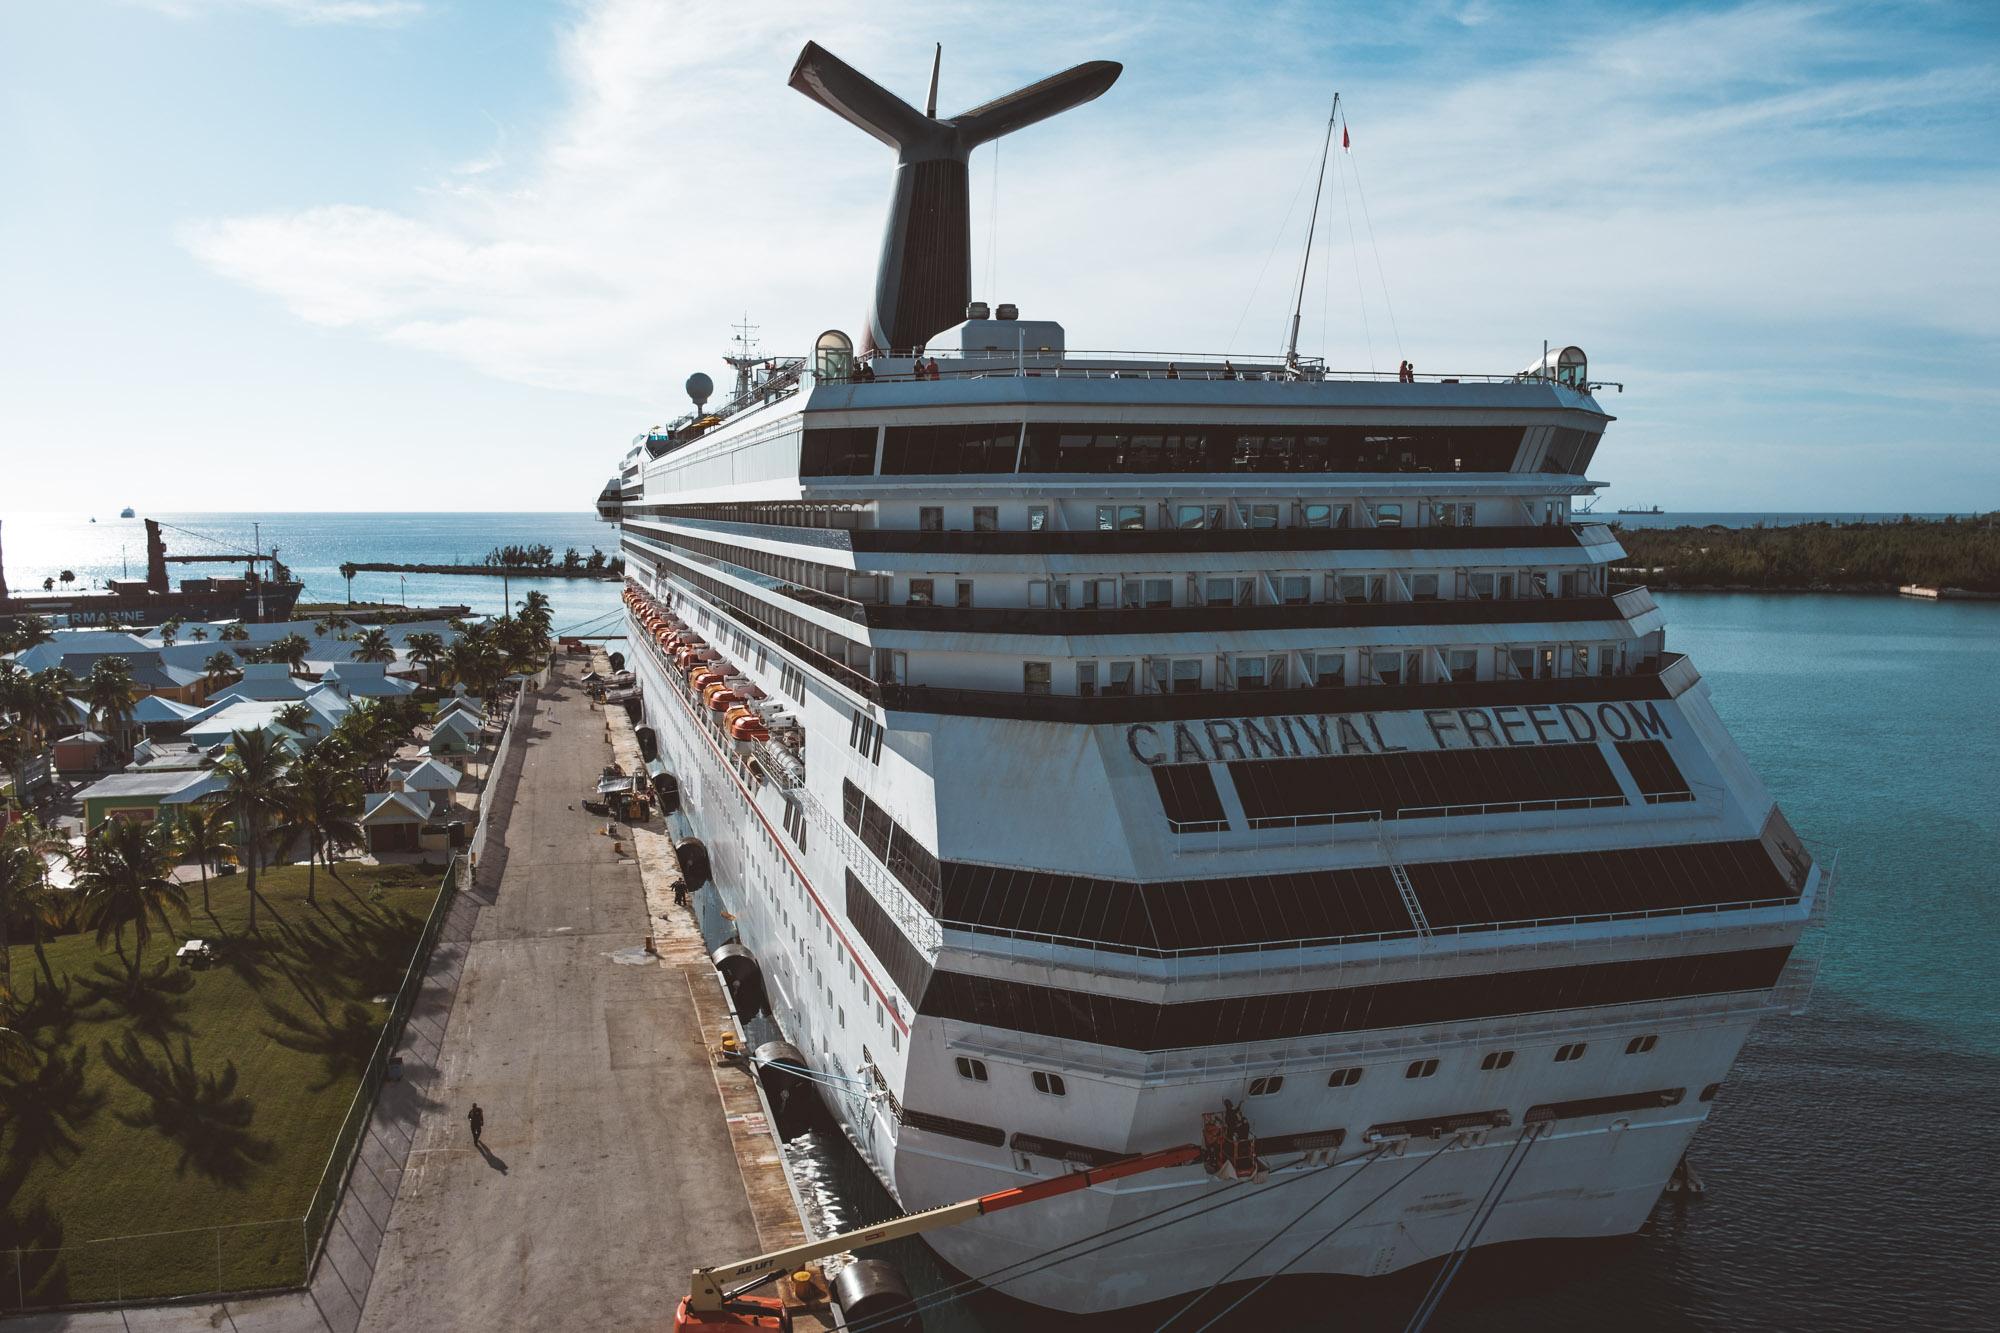 carnival-freedom-freeport-bahamas